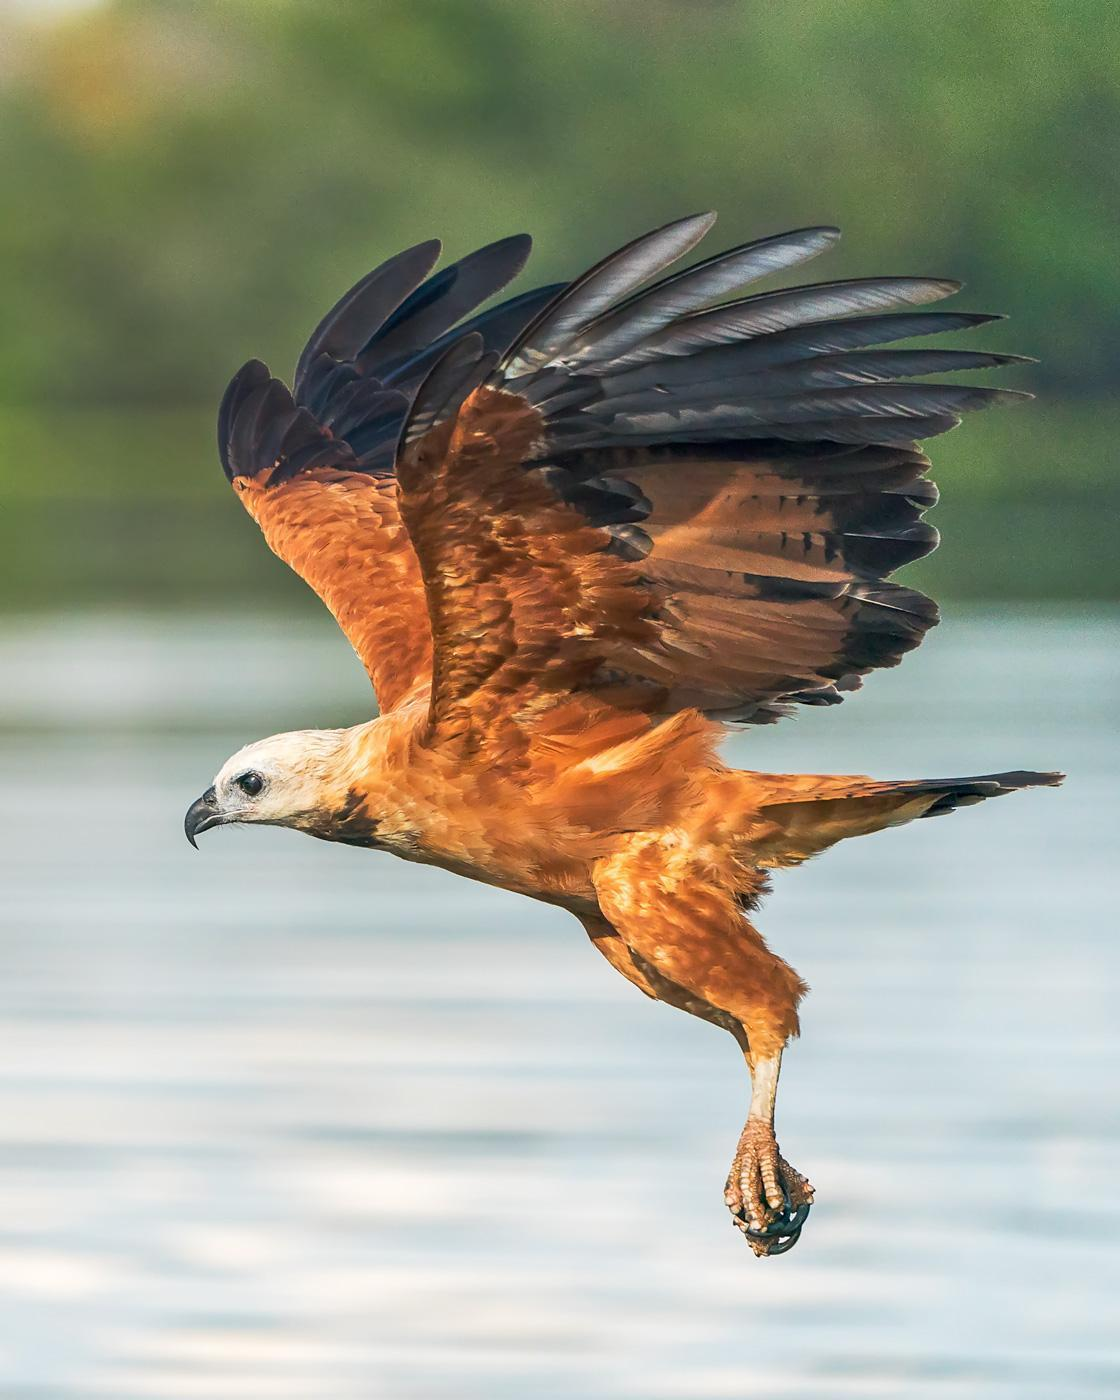 Black-collared Hawk Photo by Jose Hernandez